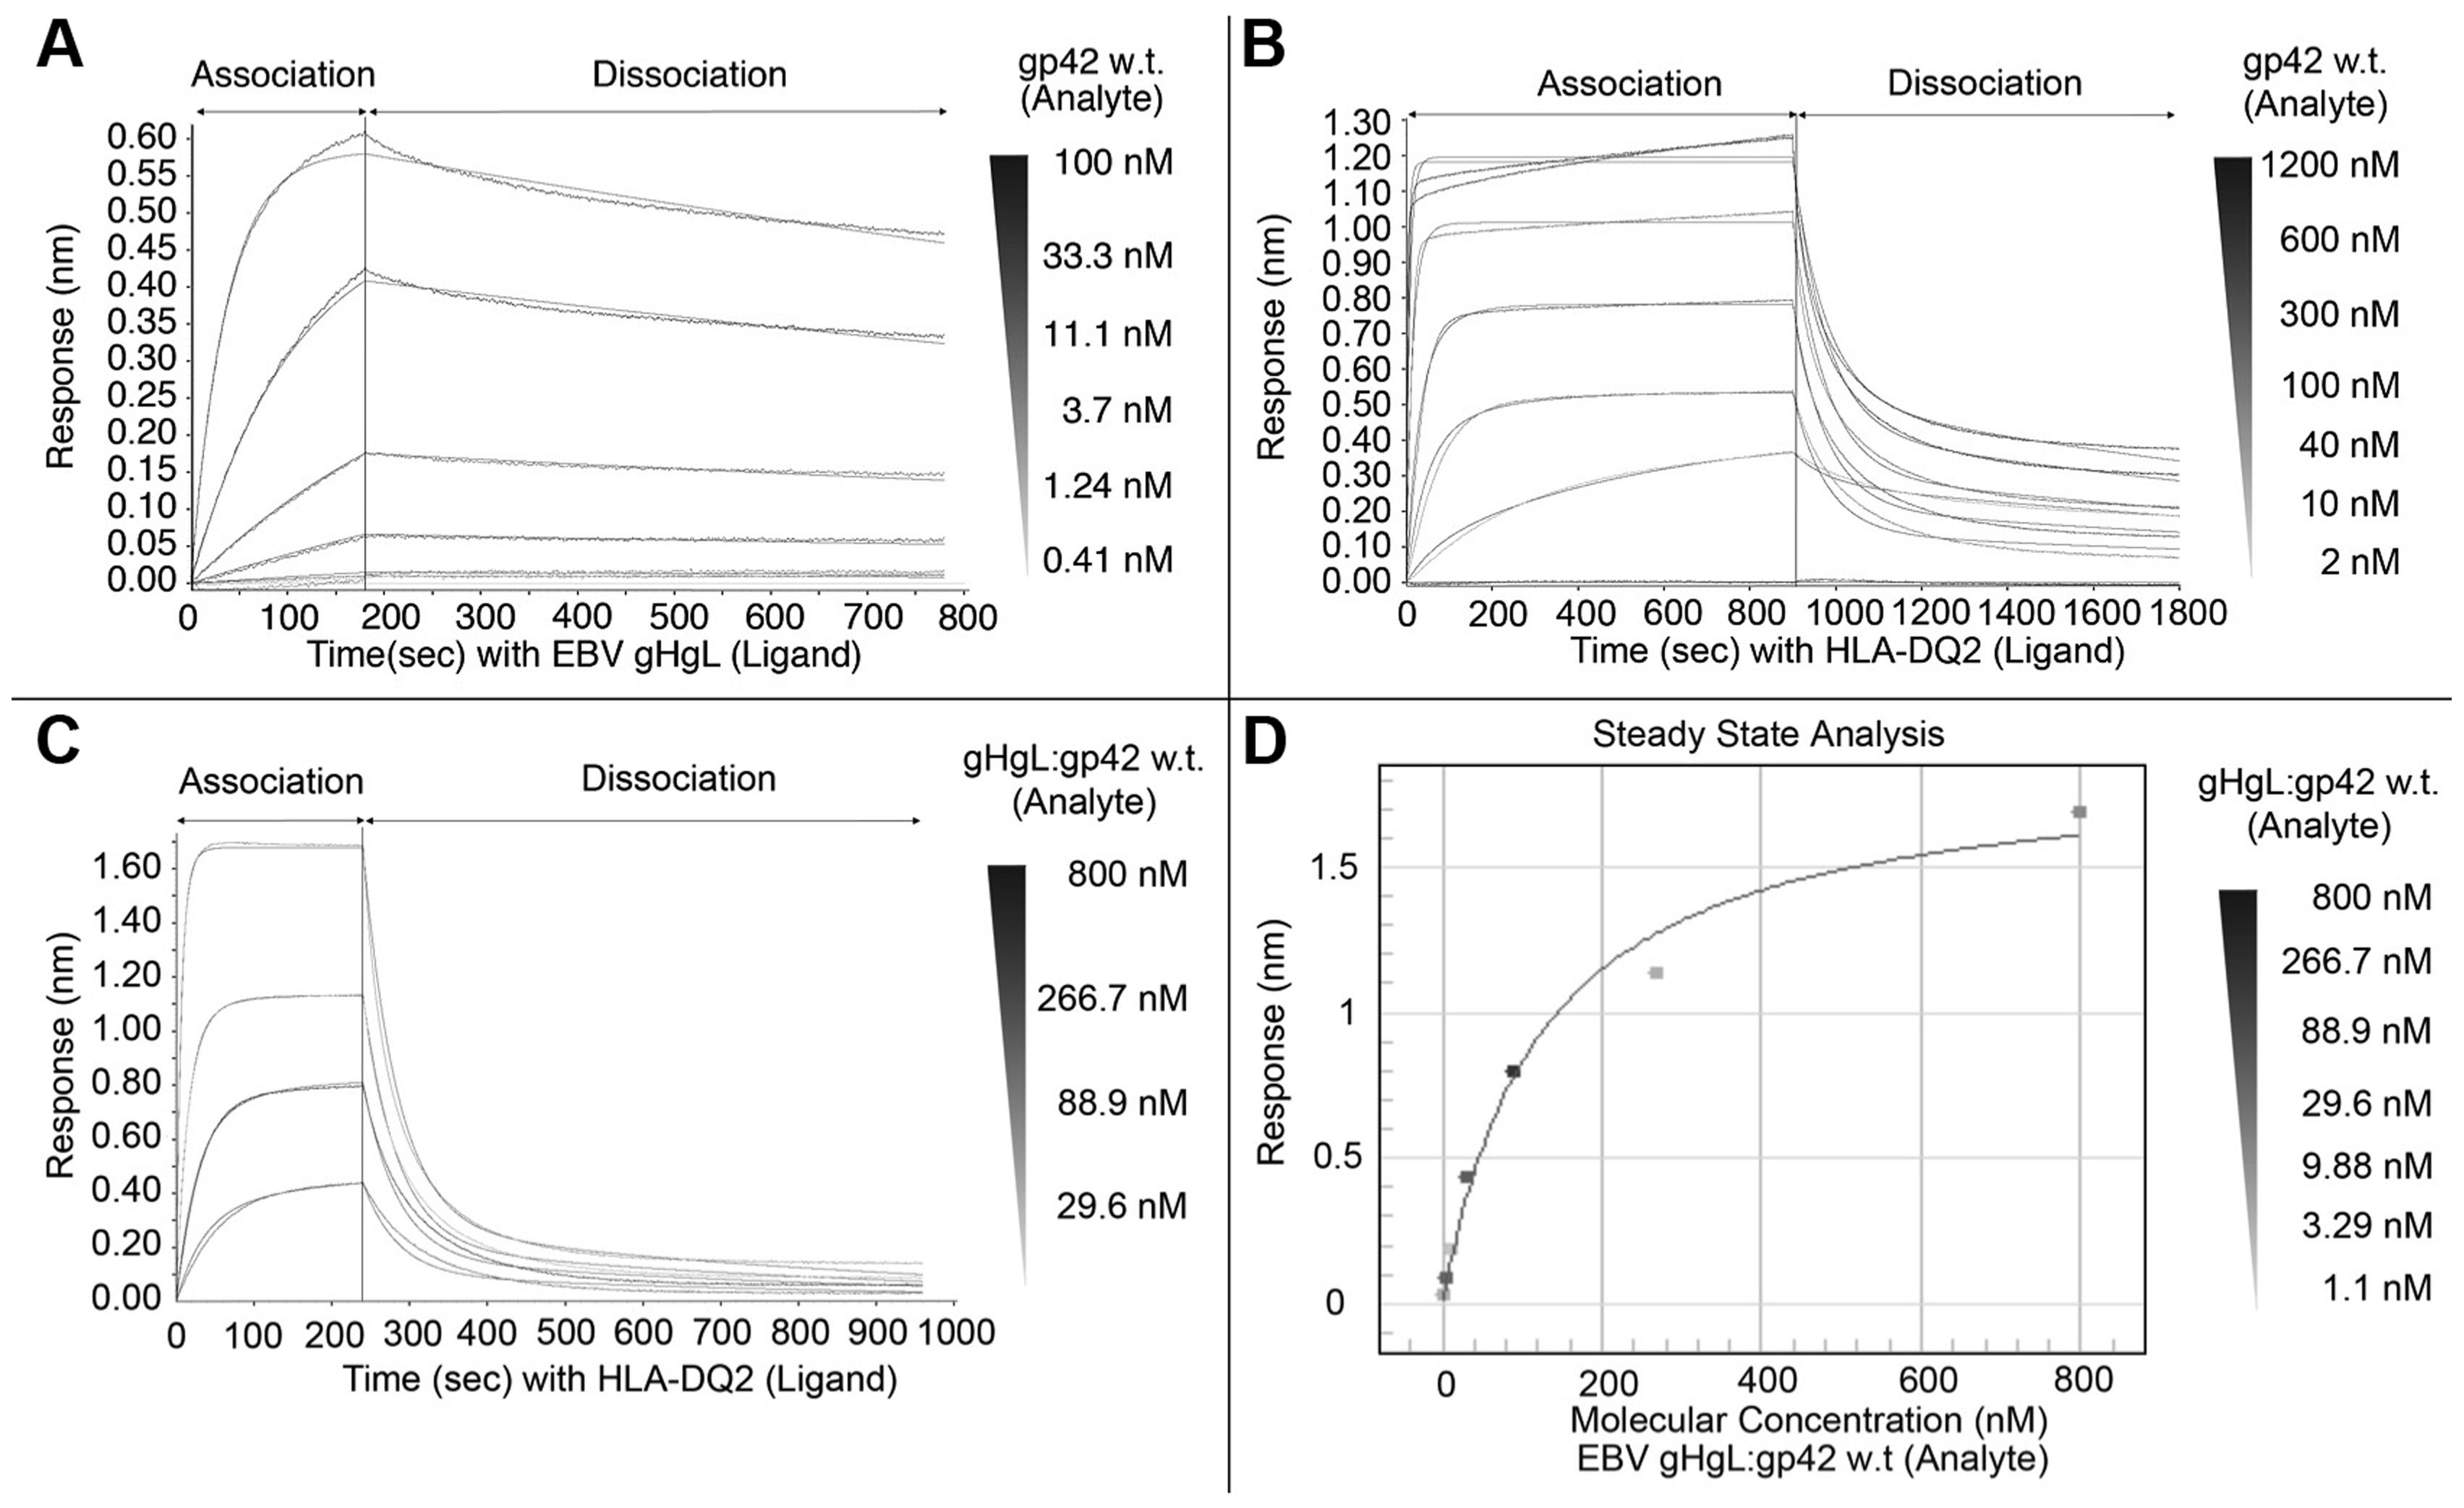 BioLayer interferometry (BLI) binding studies with wildtype gp42.